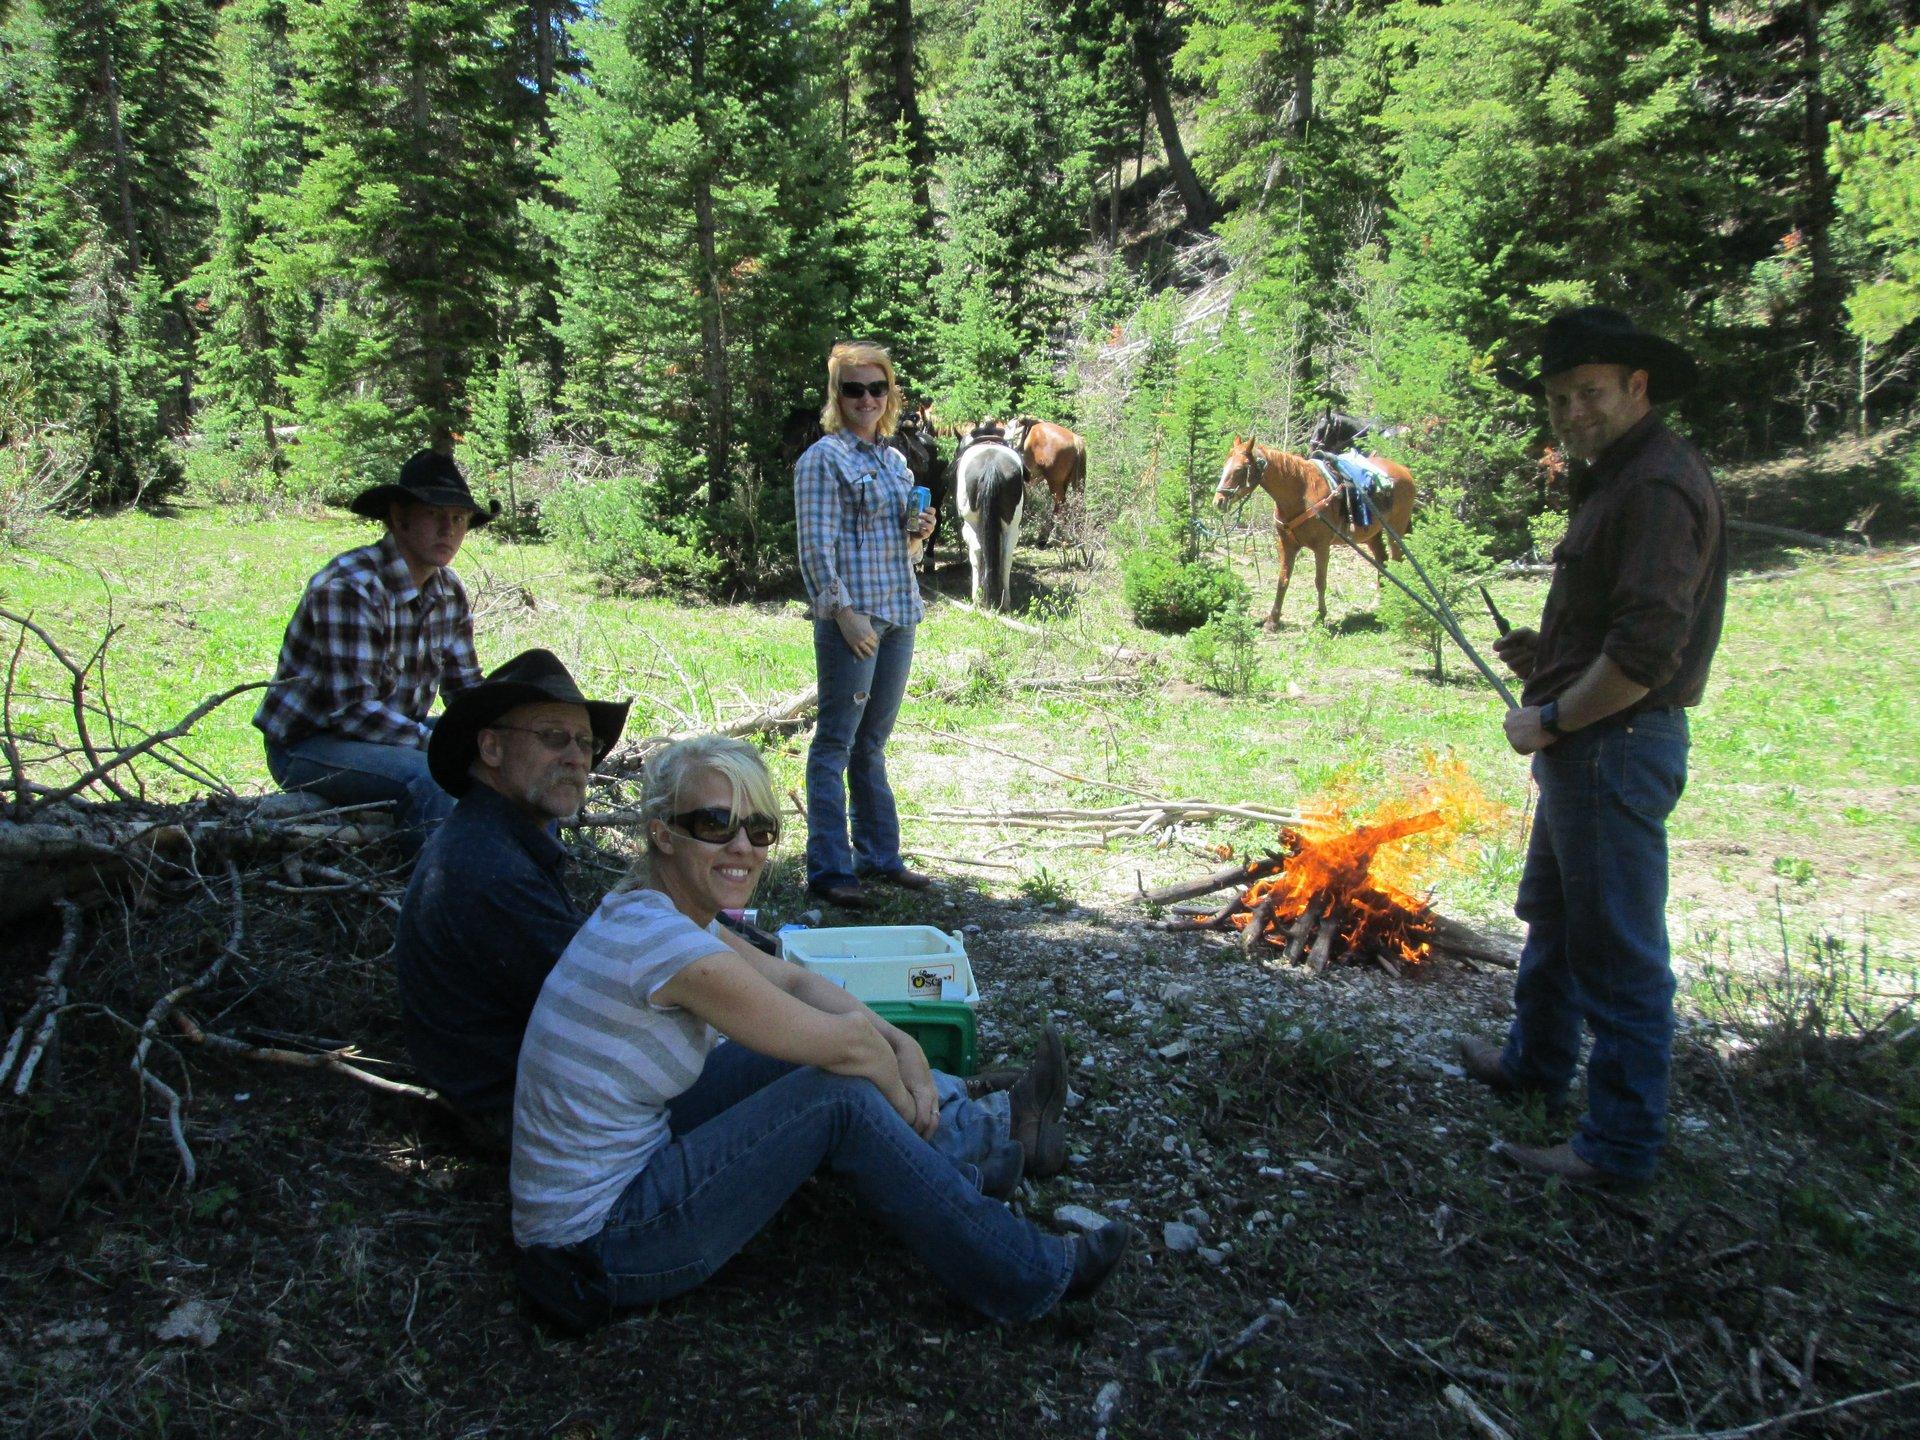 Wyoming horse back trip